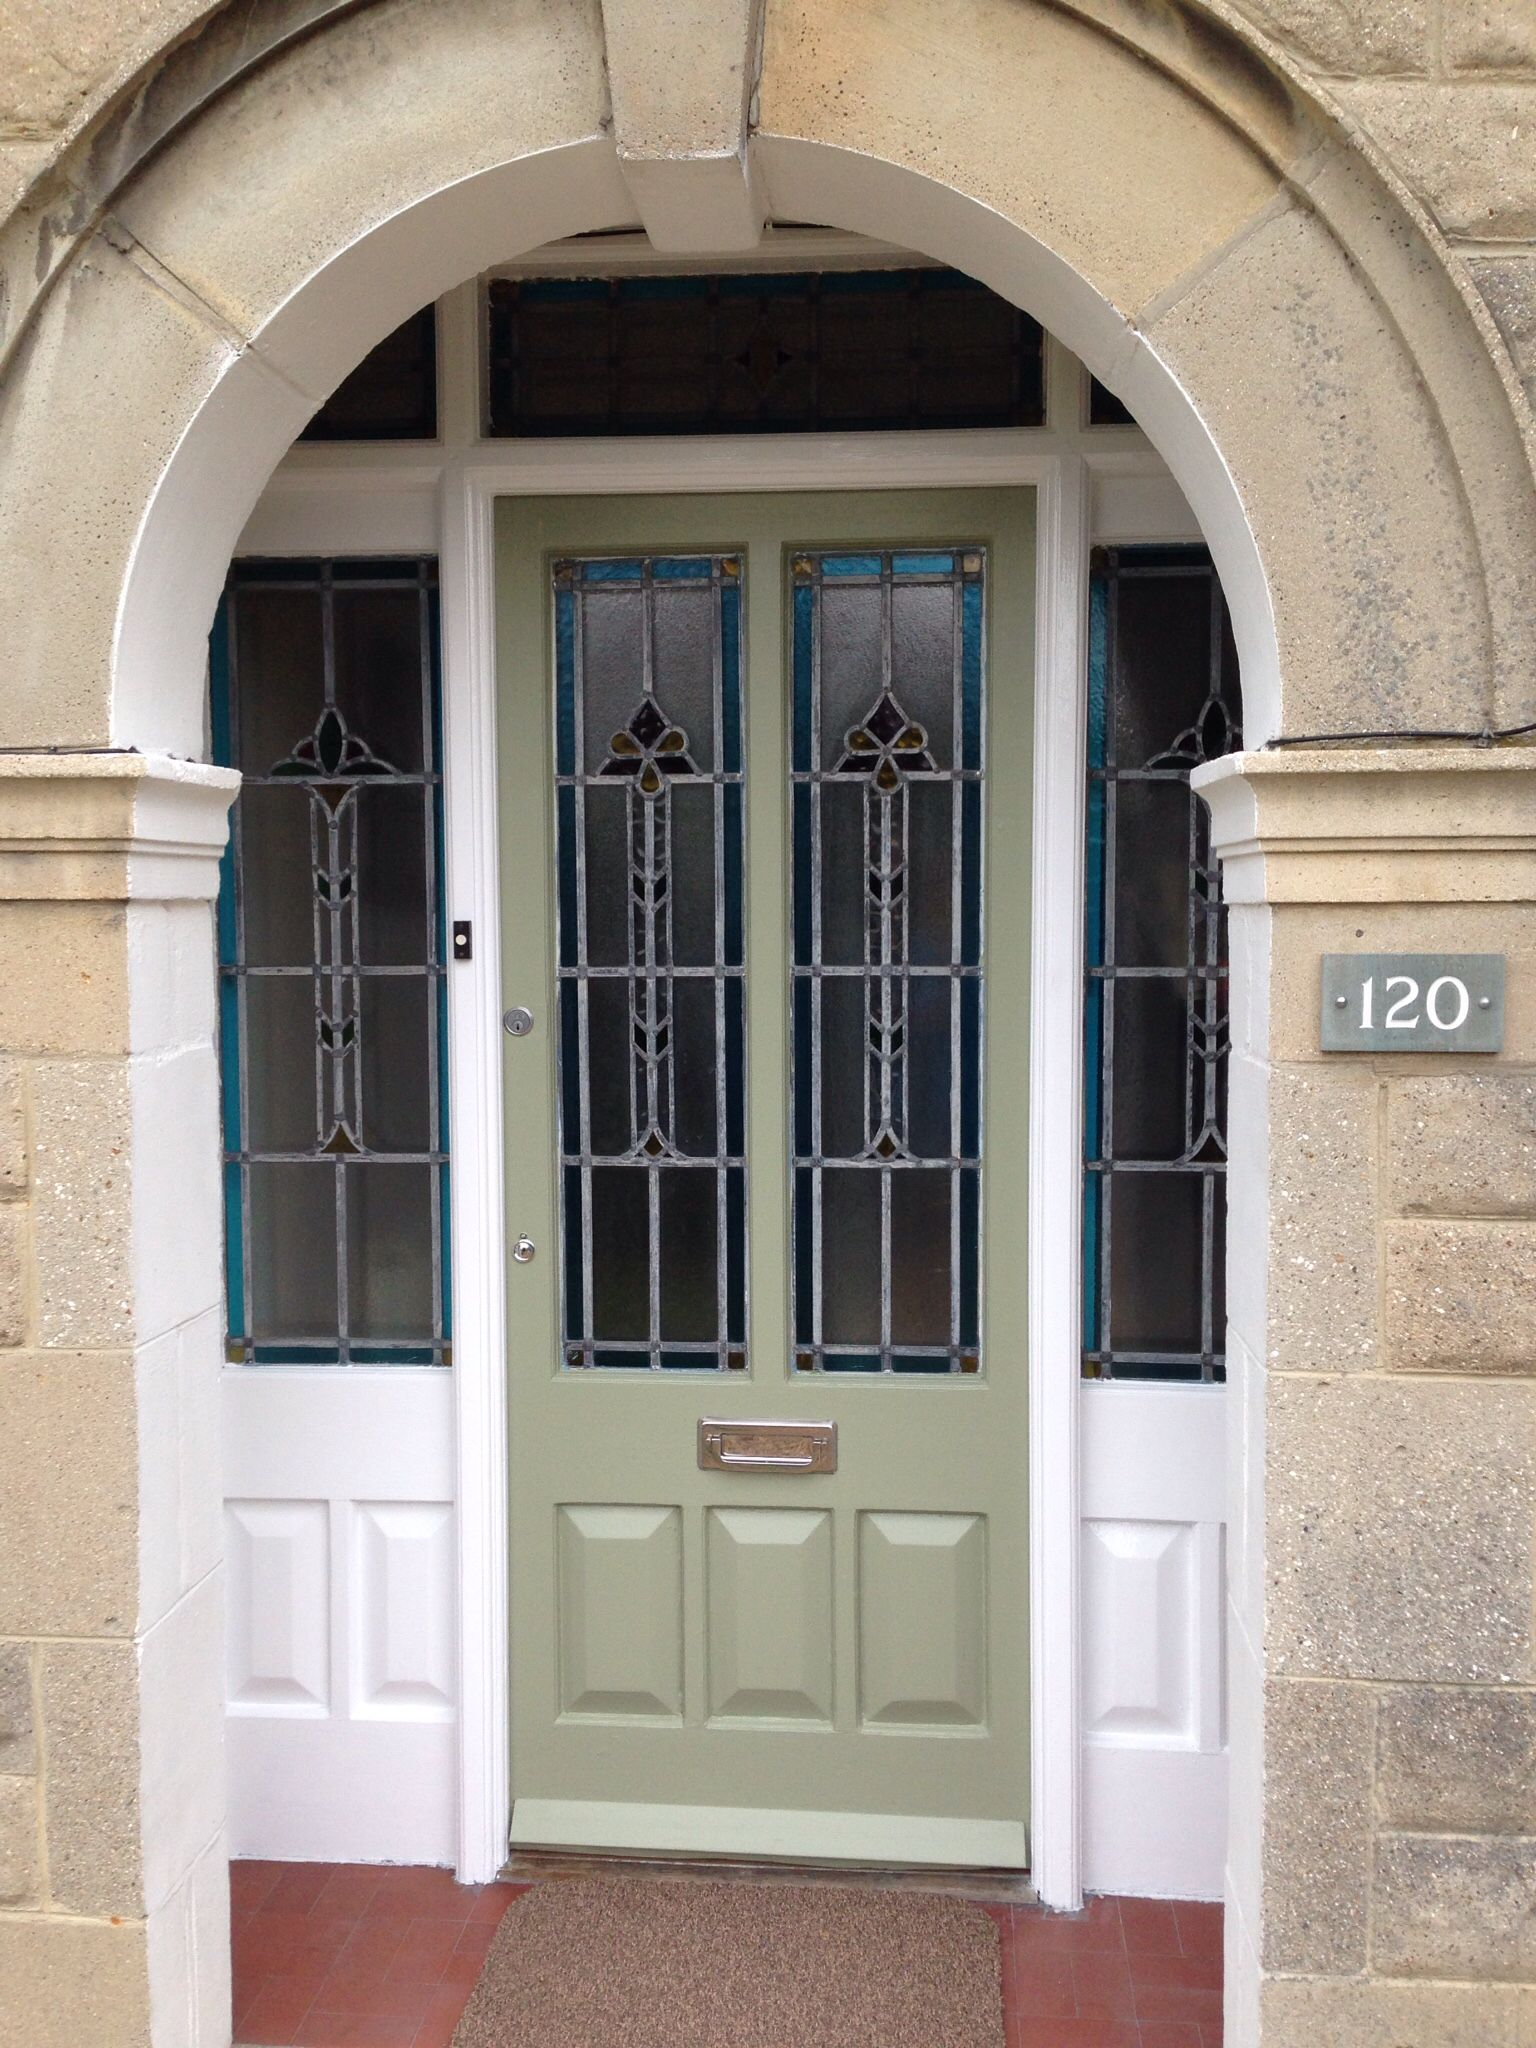 1930 front door farrow and ball lichen no 19 farrow - Farrow and ball exterior door paint ...